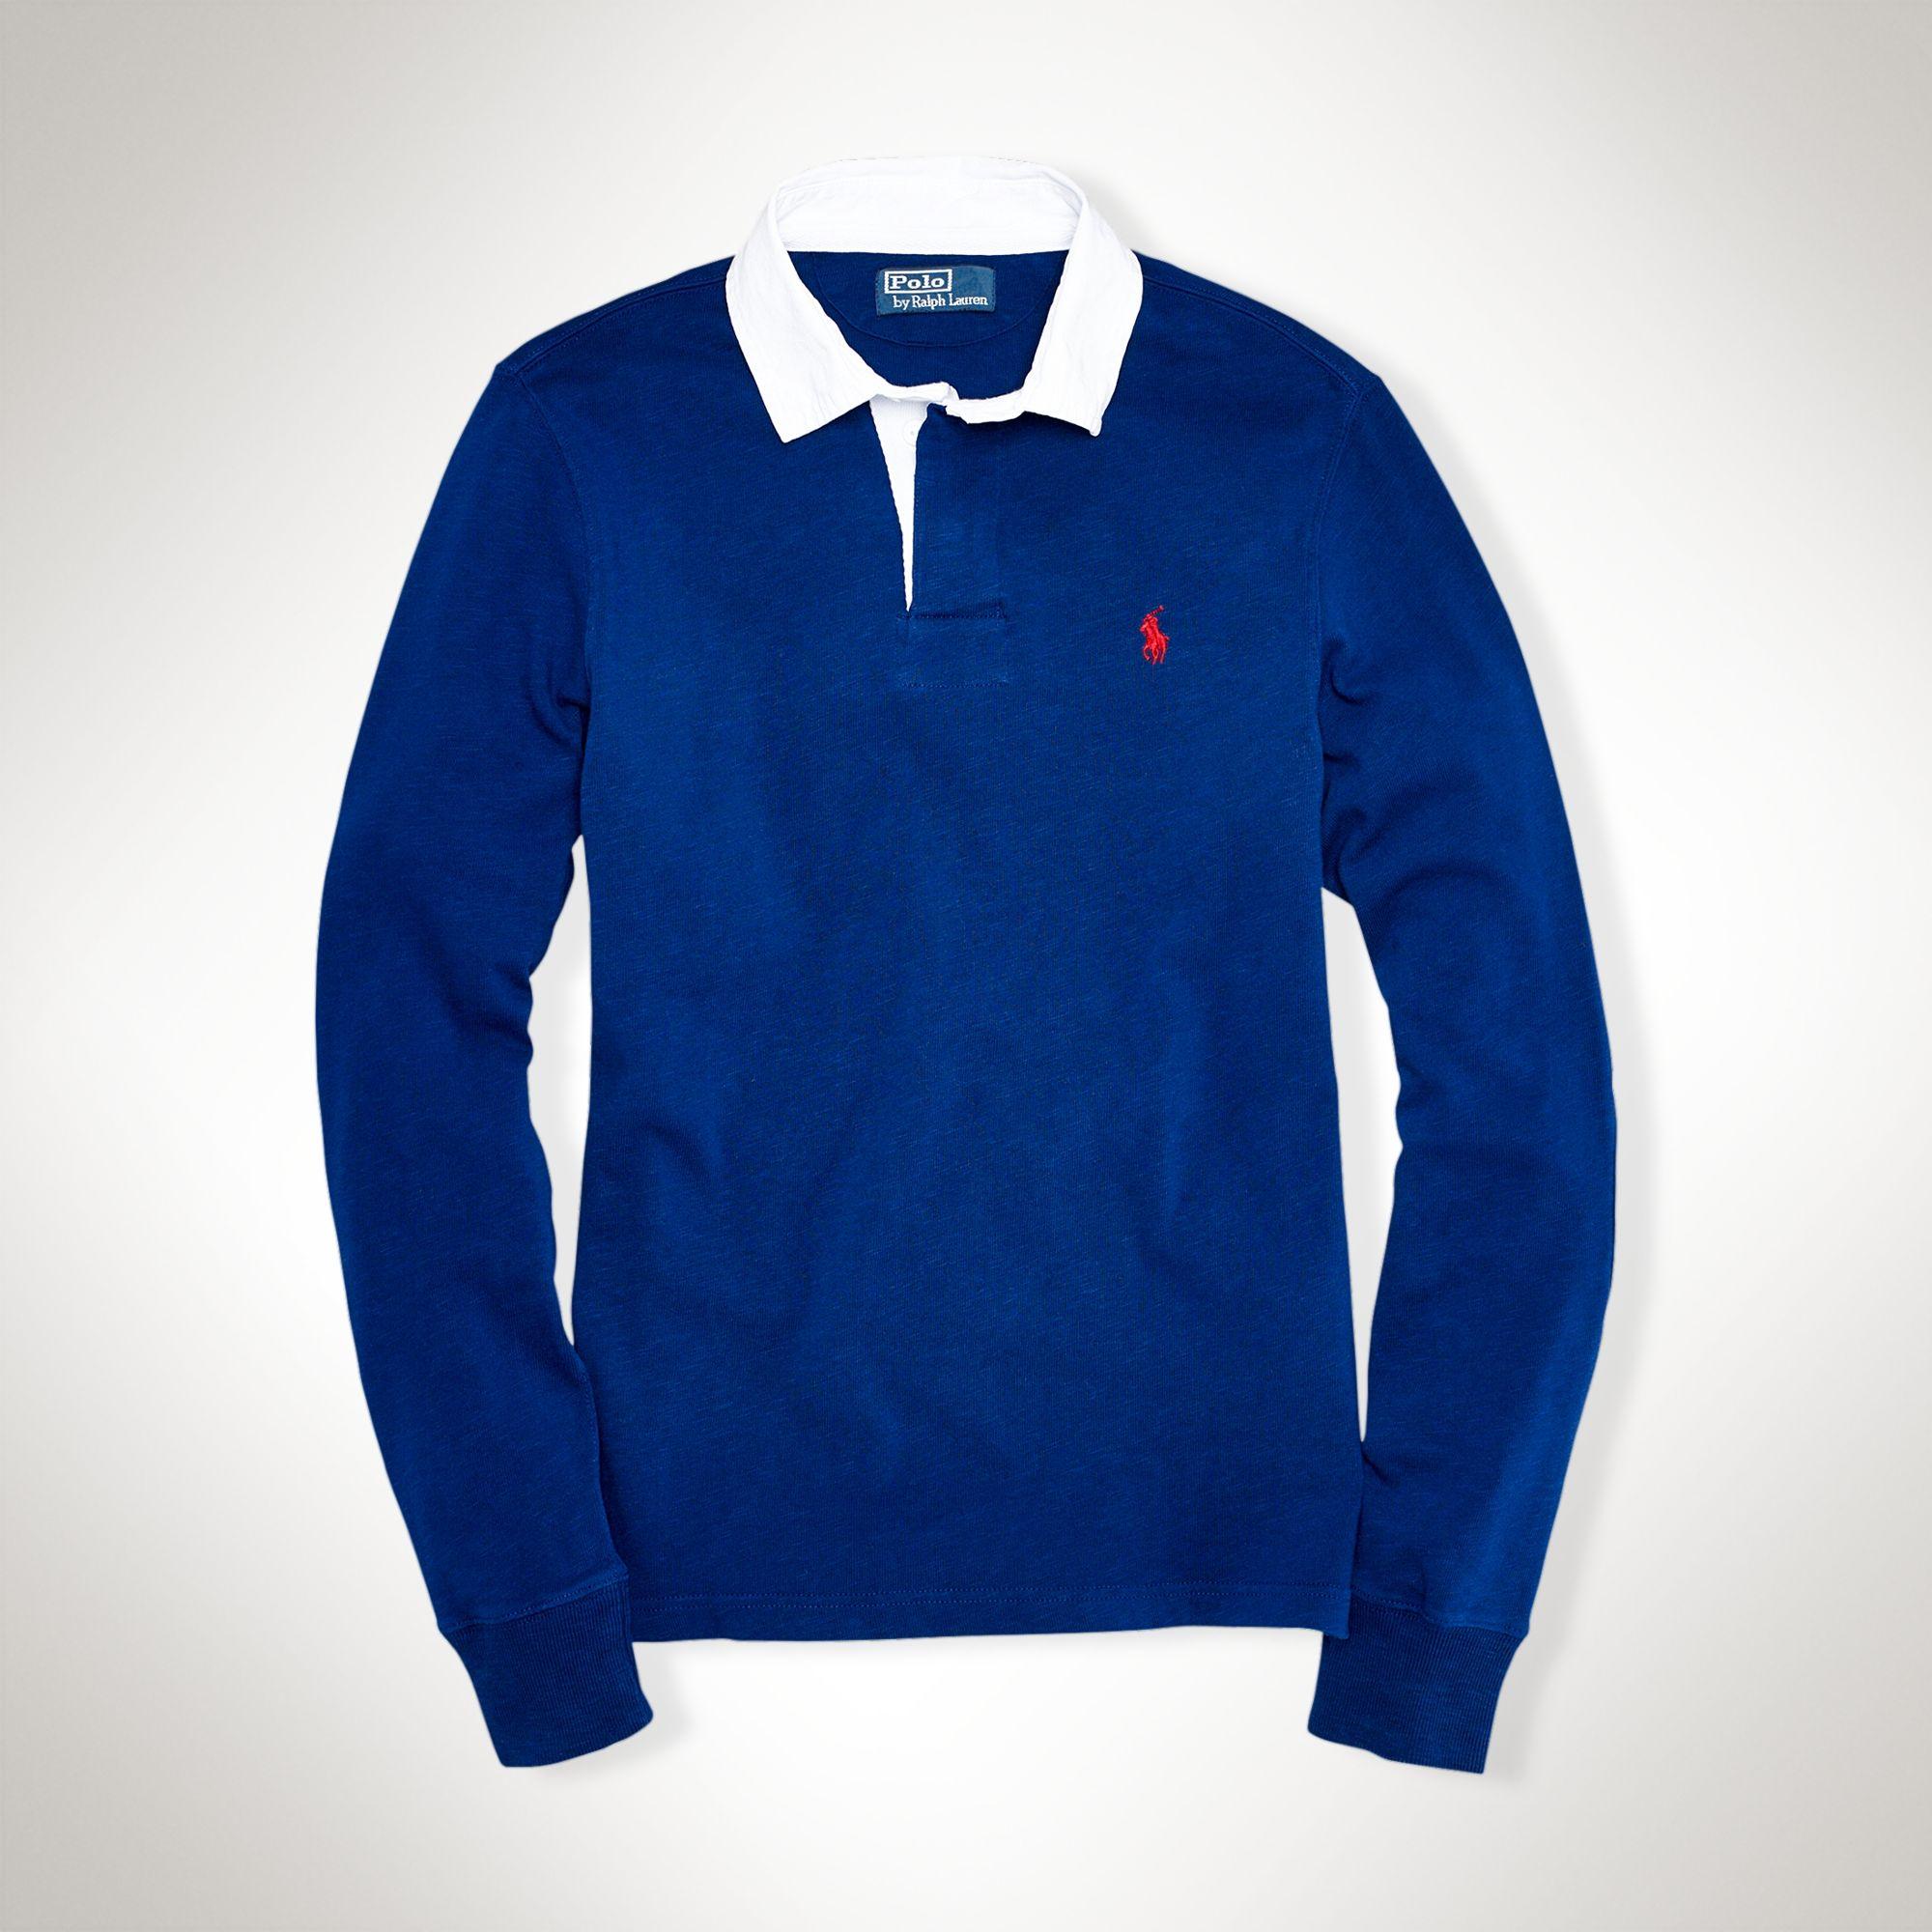 ralph lauren rugby shirt slim fit - WörterSee Public Relations 509e729a93